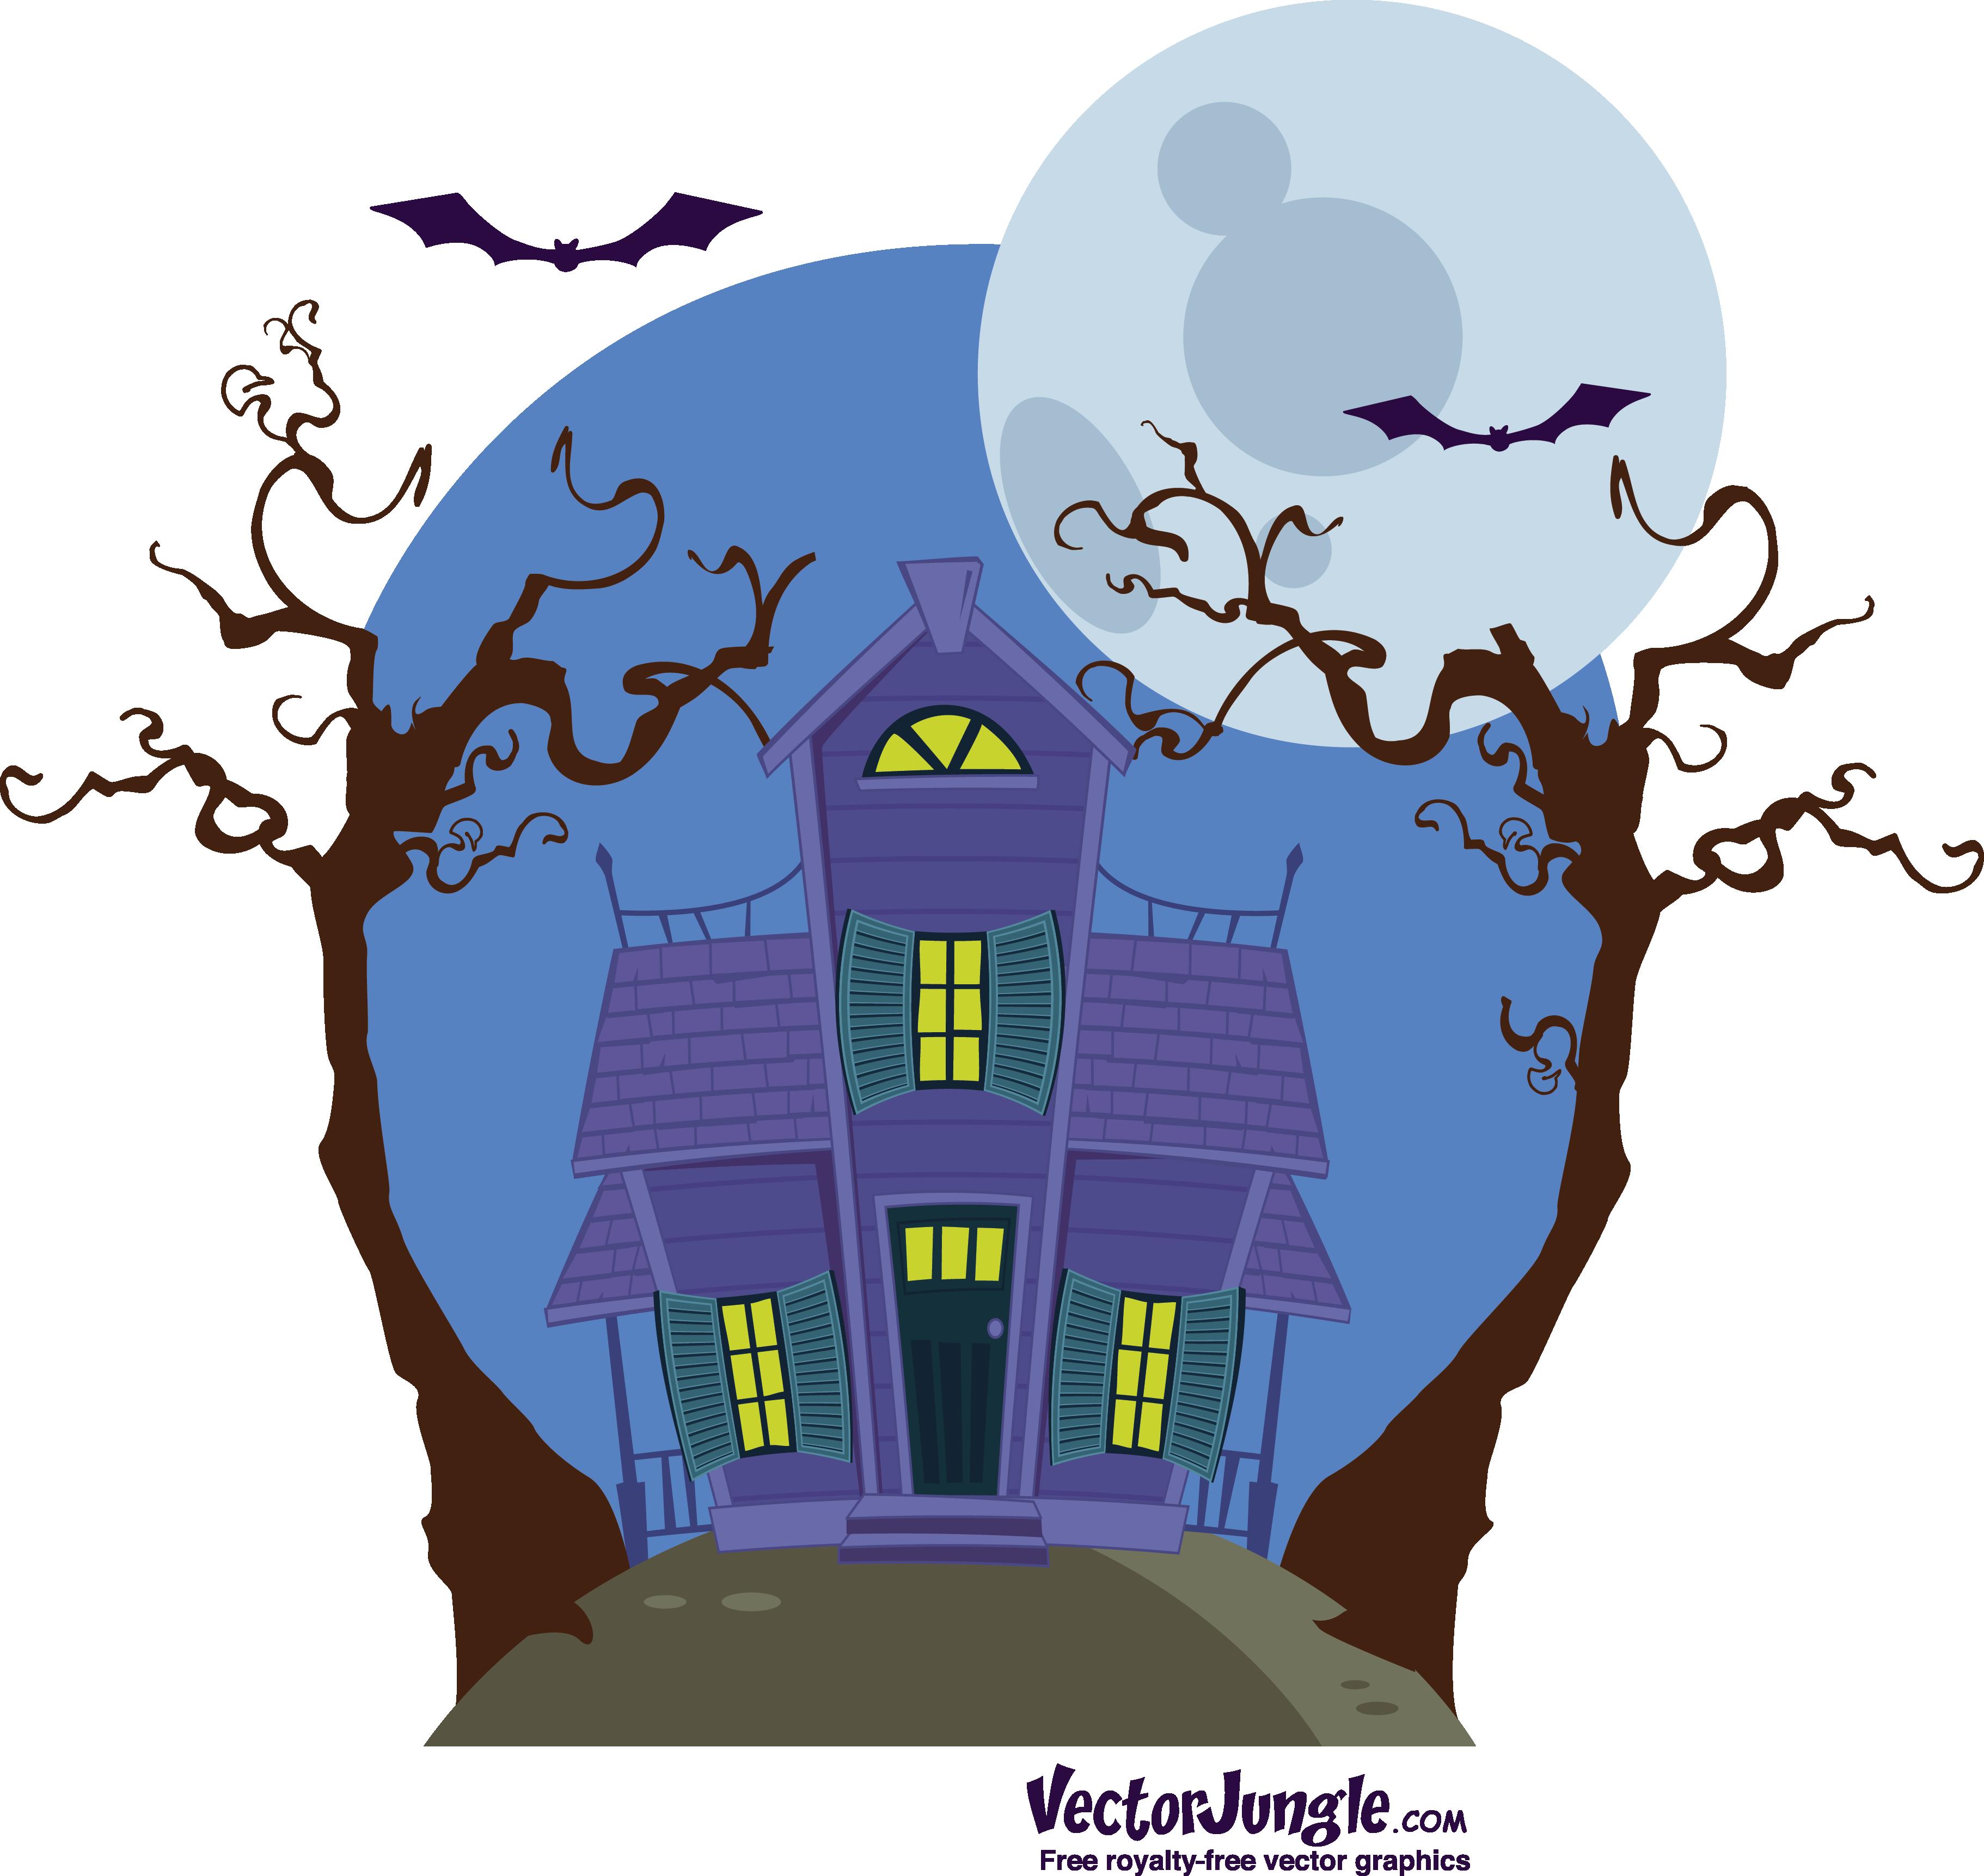 free vector halloween haunted house | vectorjungle - free vector